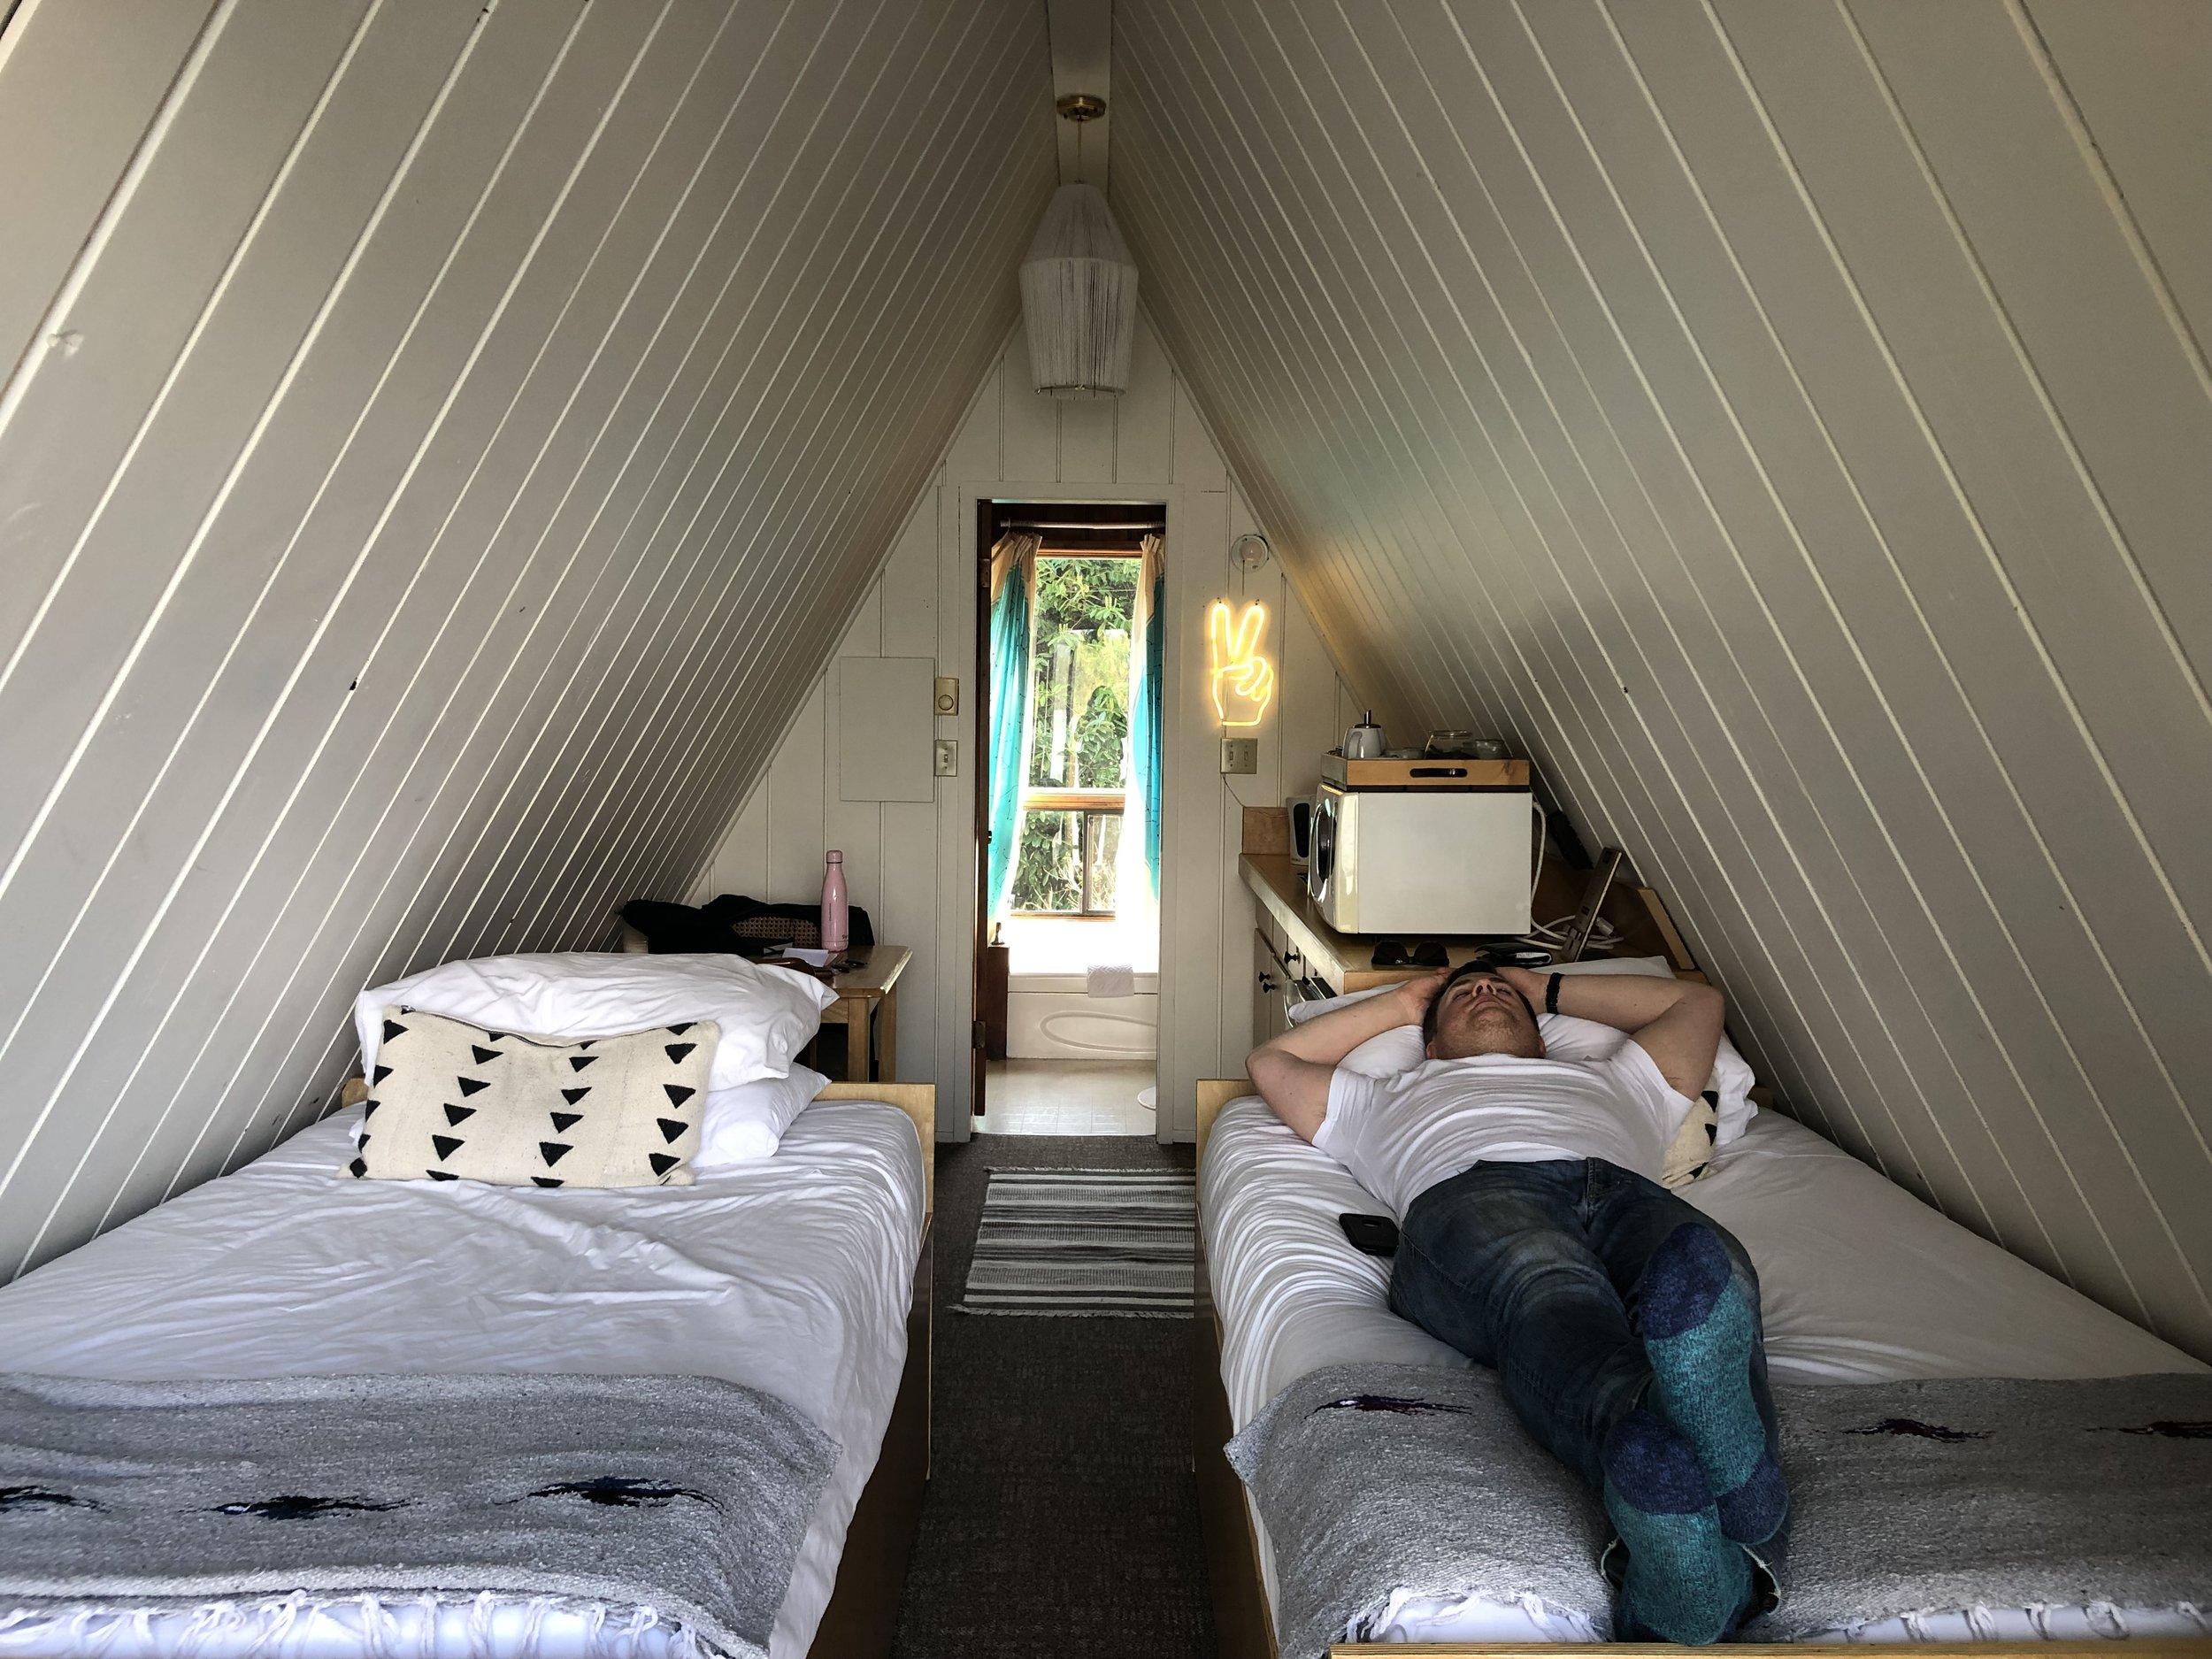 Dave making himself at home